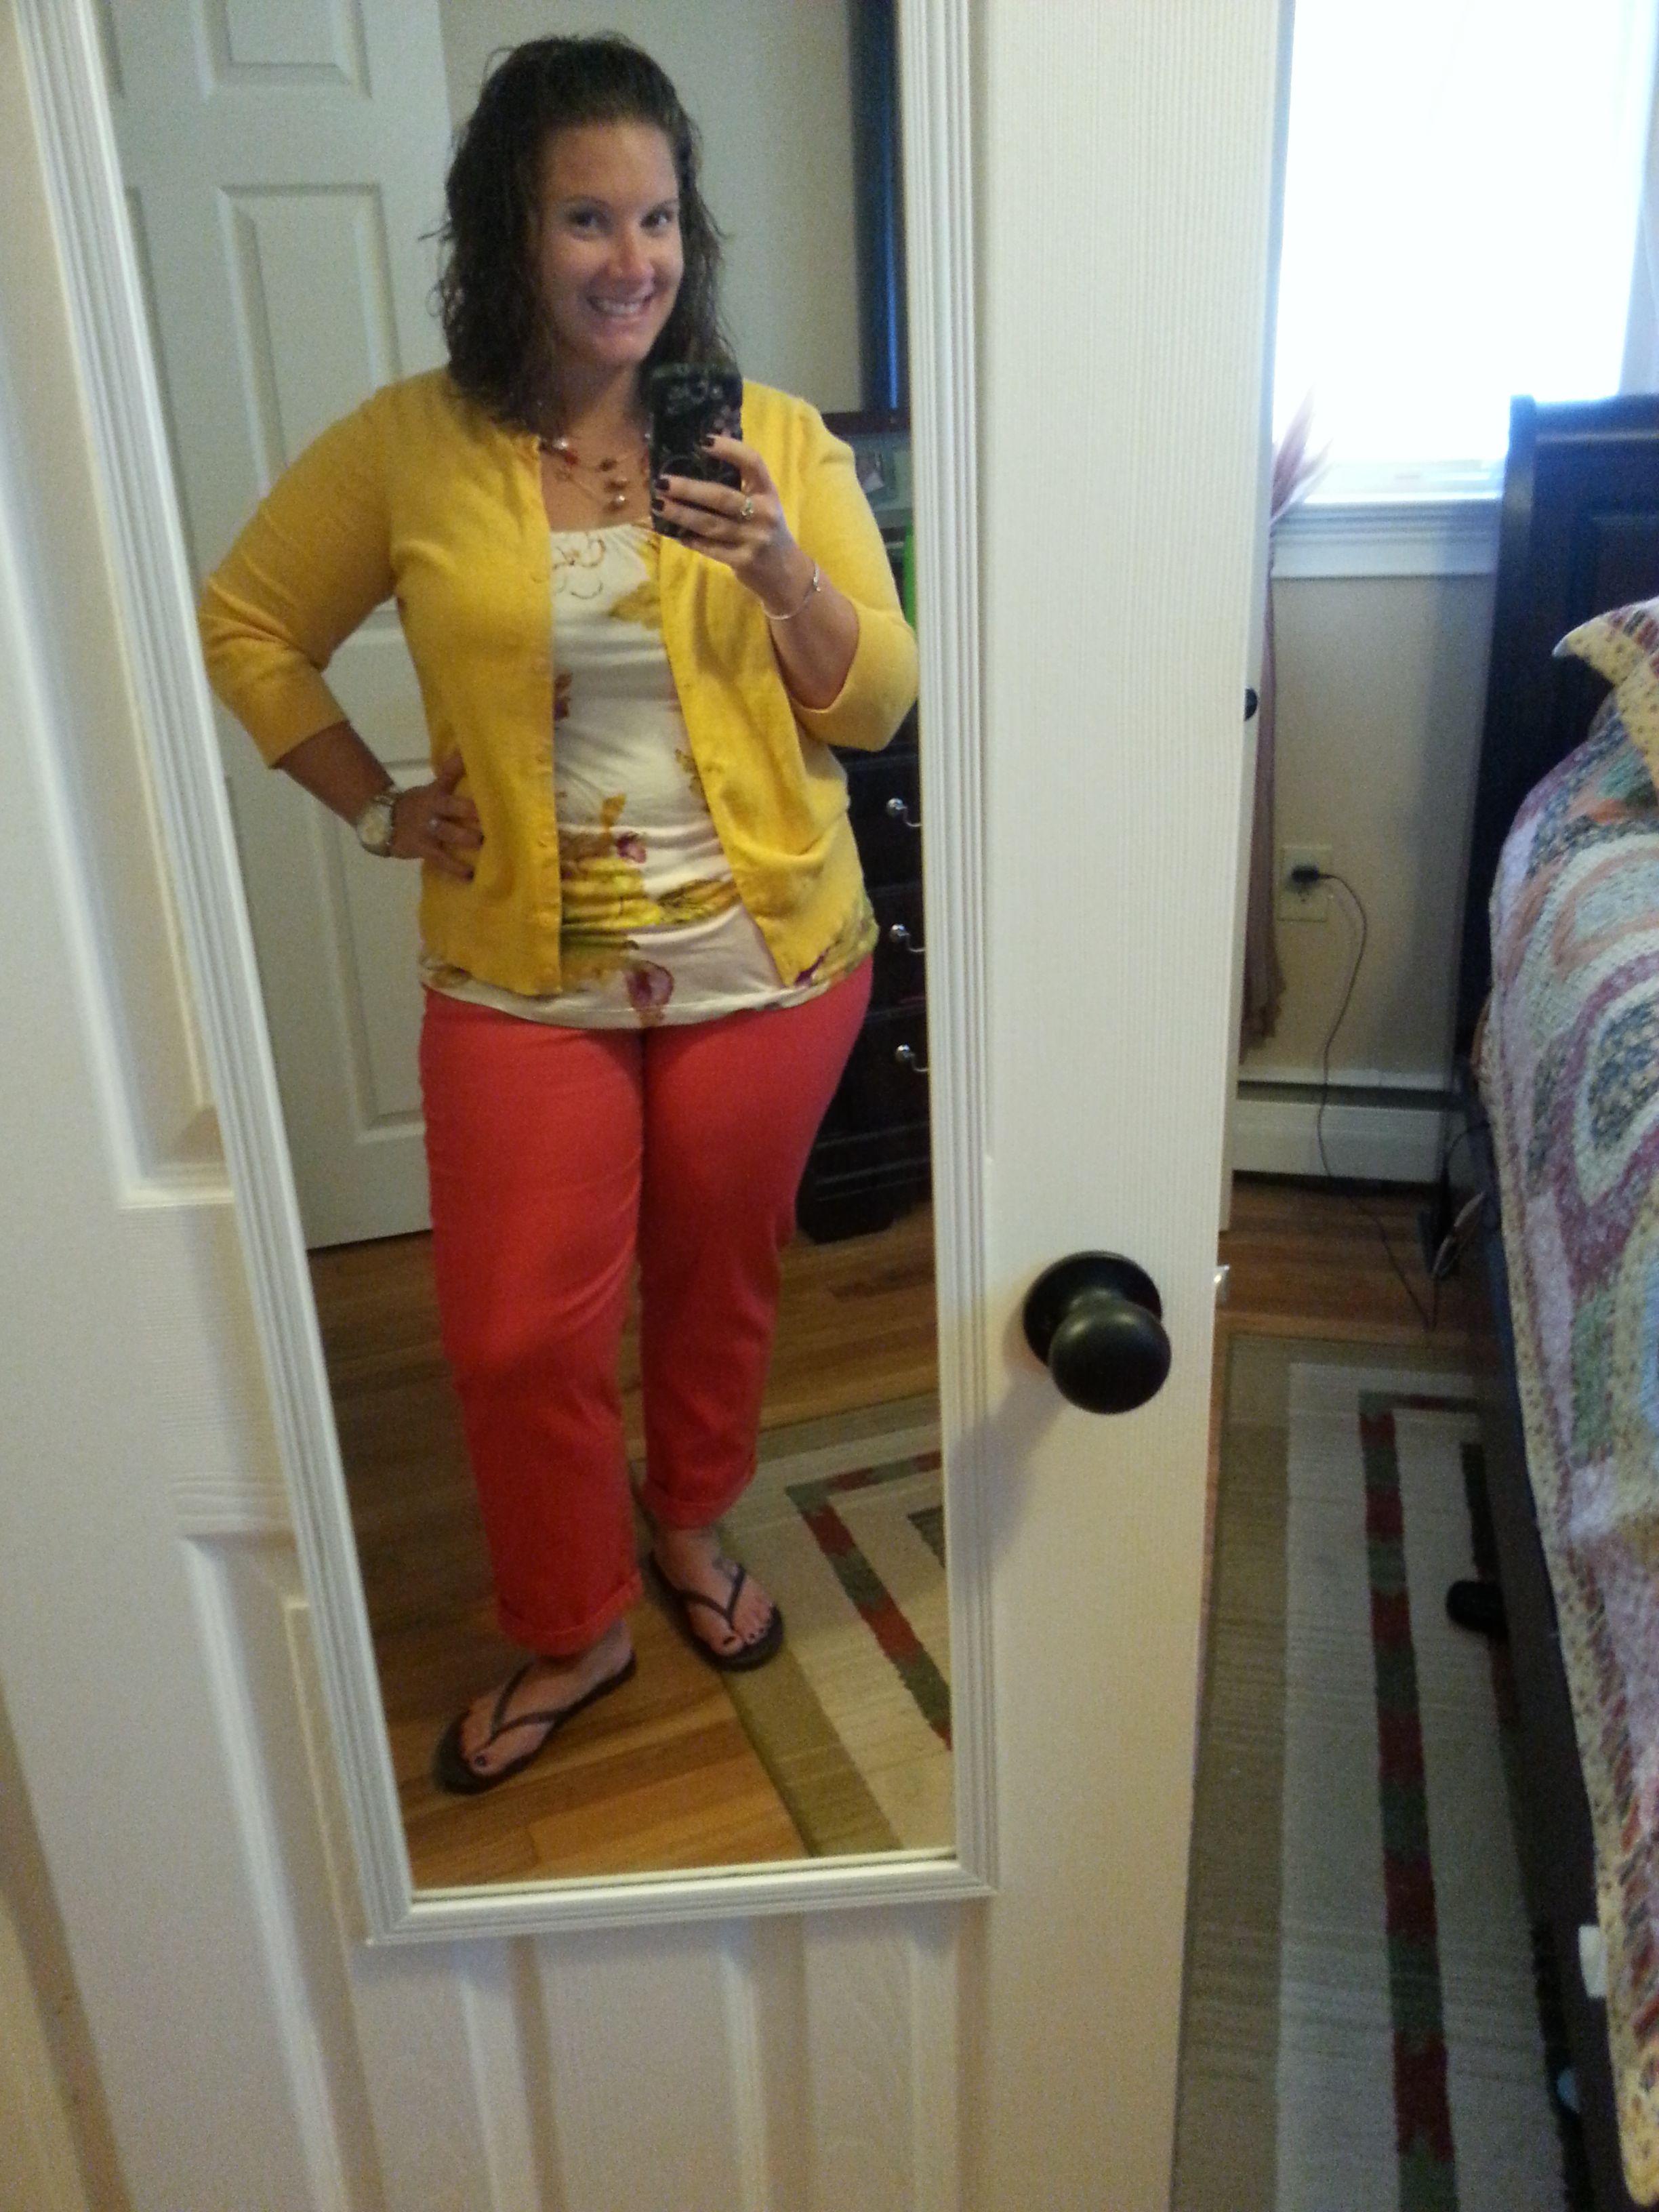 coral short pants, floral shirt, yellow cardigan | Cardigan Queen ...